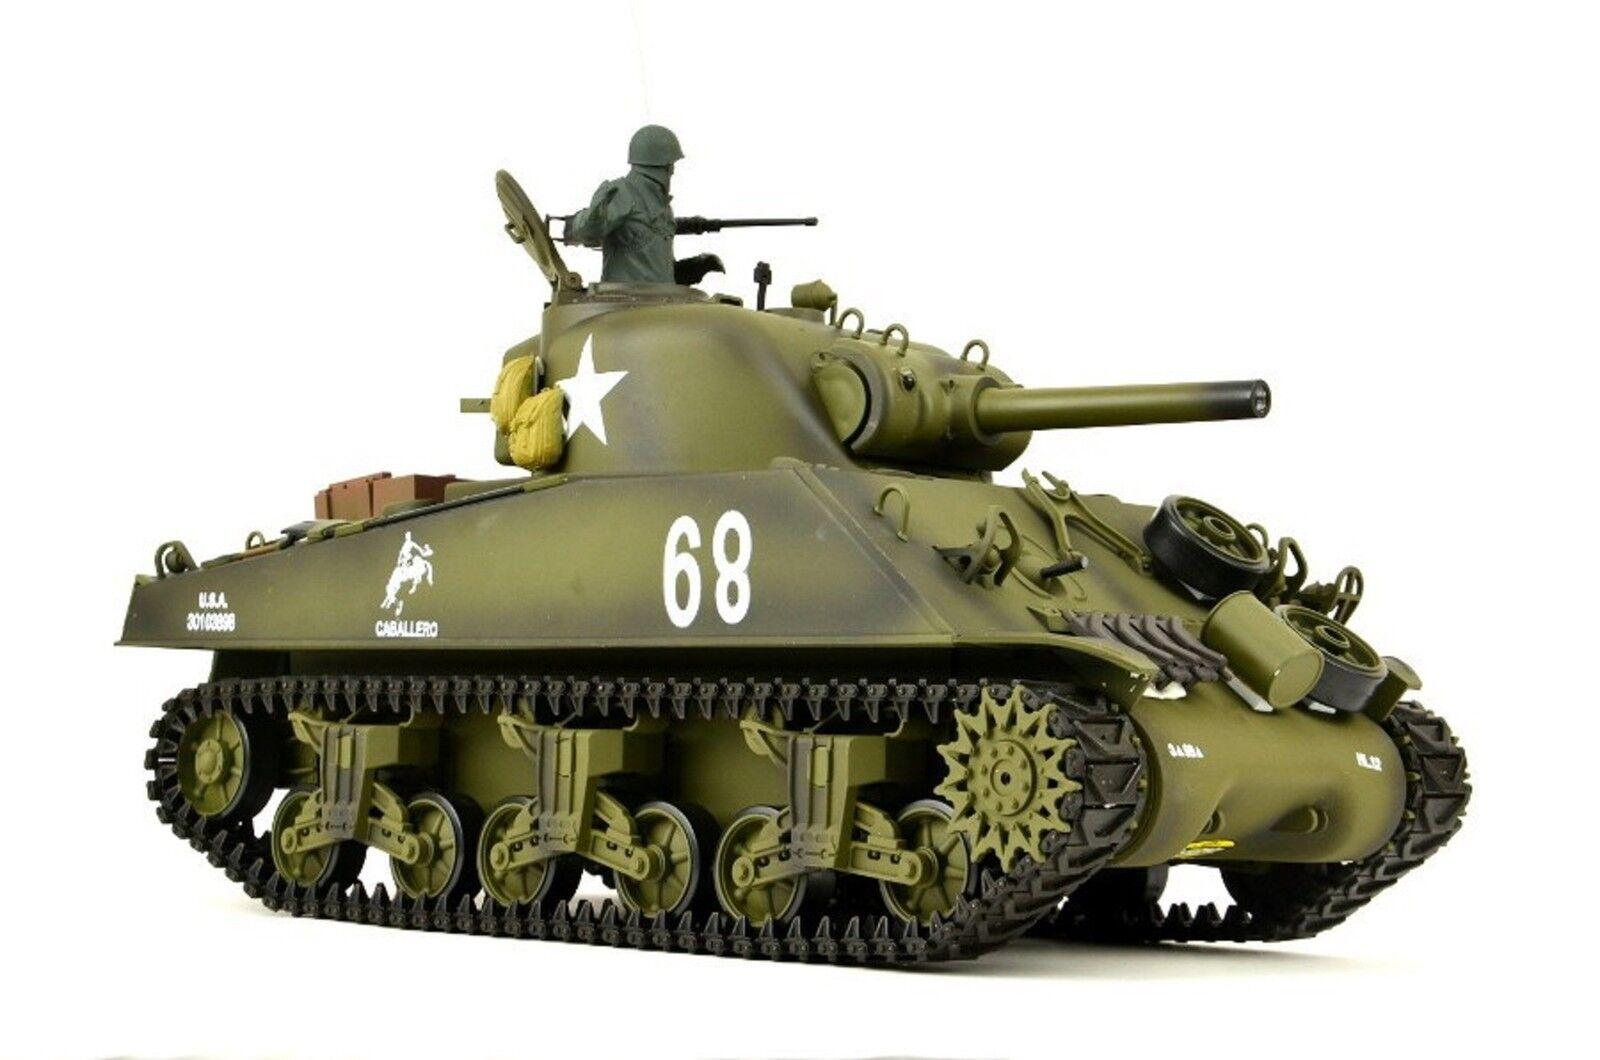 Heng Long RC tanques us m4a3 Sherman Sherman Sherman pro 1 16 con humo y sonido, 2,4ghz c1b5a0